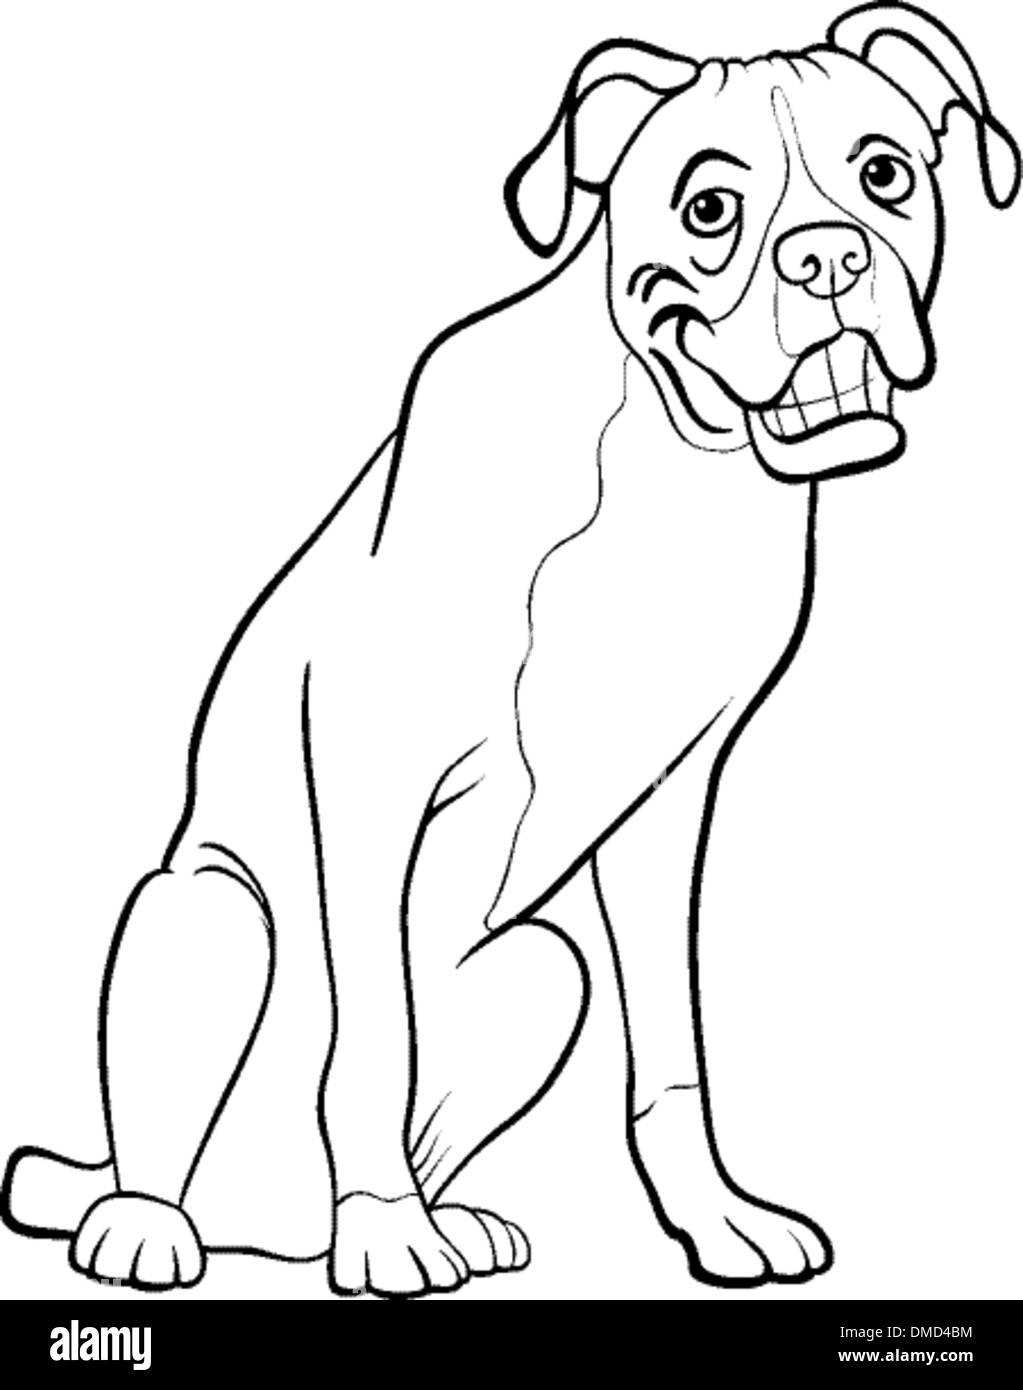 Boxer Dog Cartoon For Coloring Book